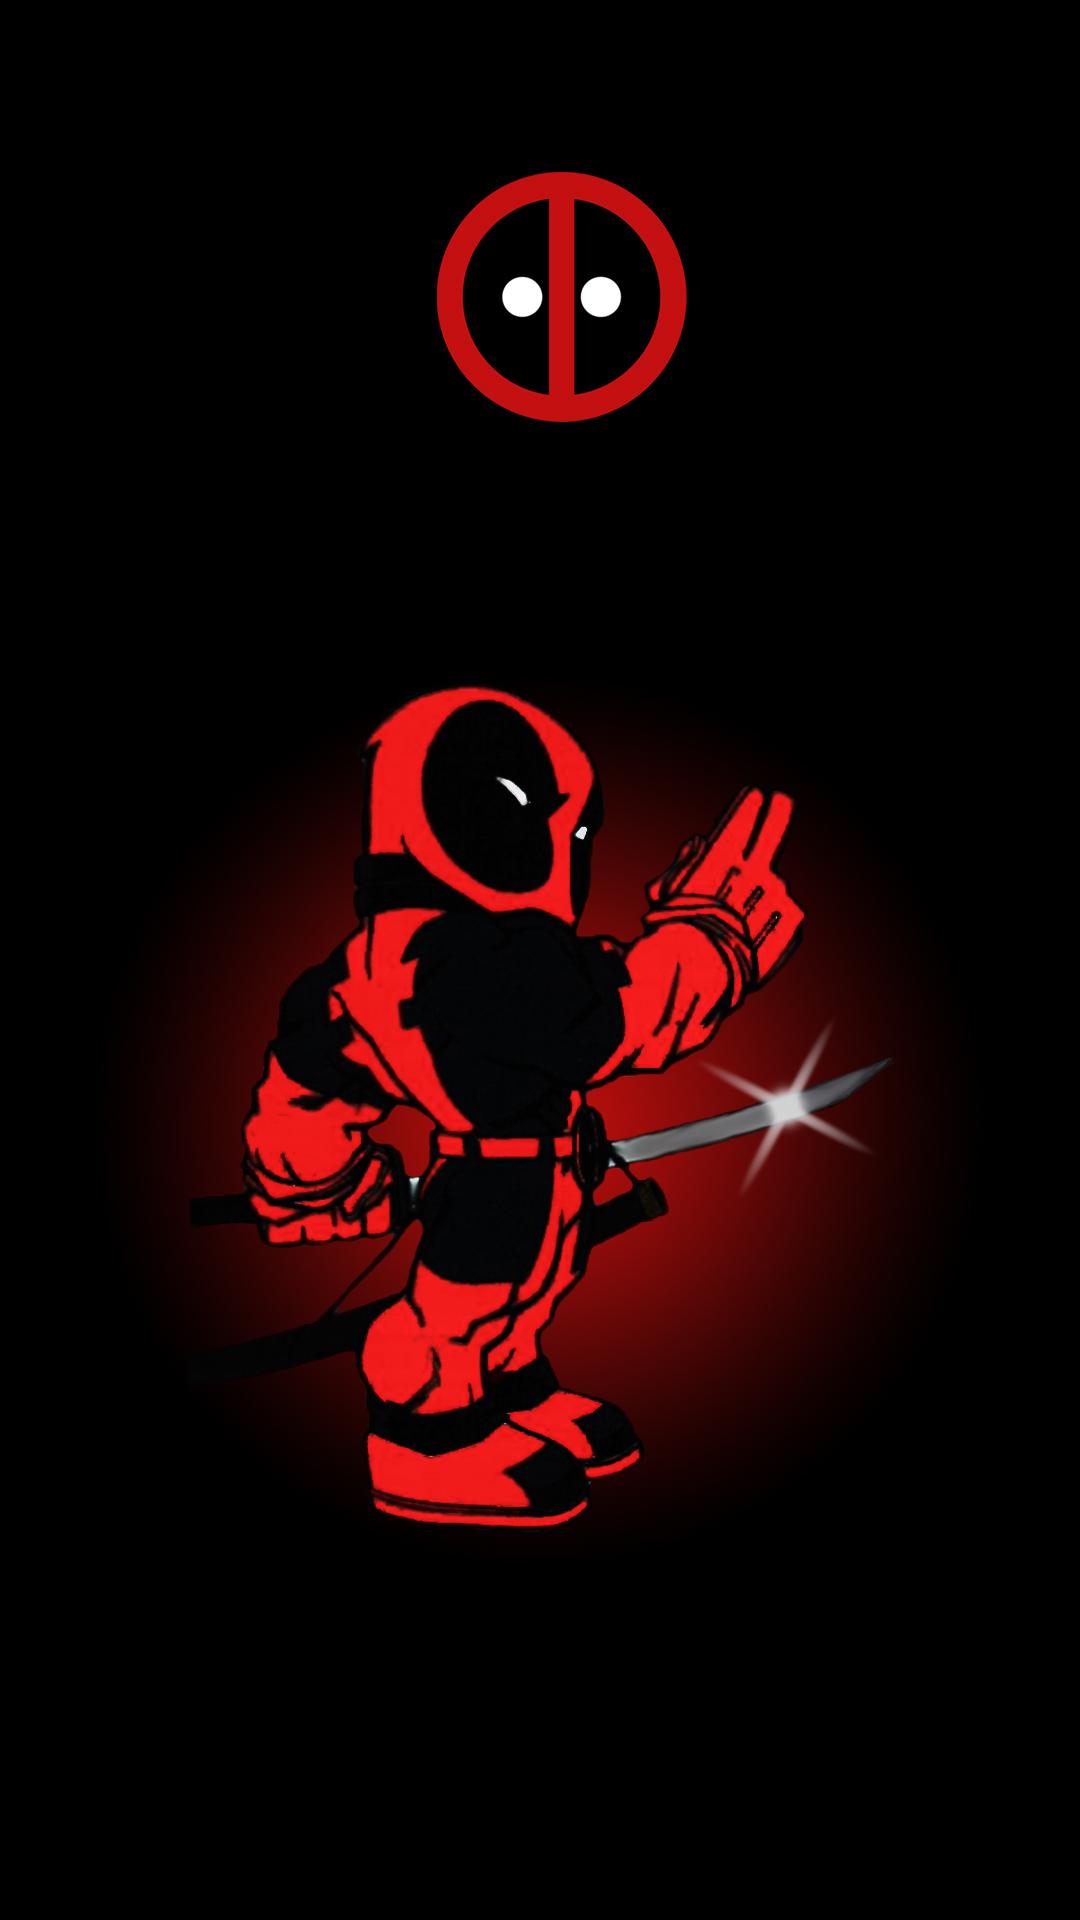 35 Ideas For Iphone 1080p Deadpool Wallpaper Hd